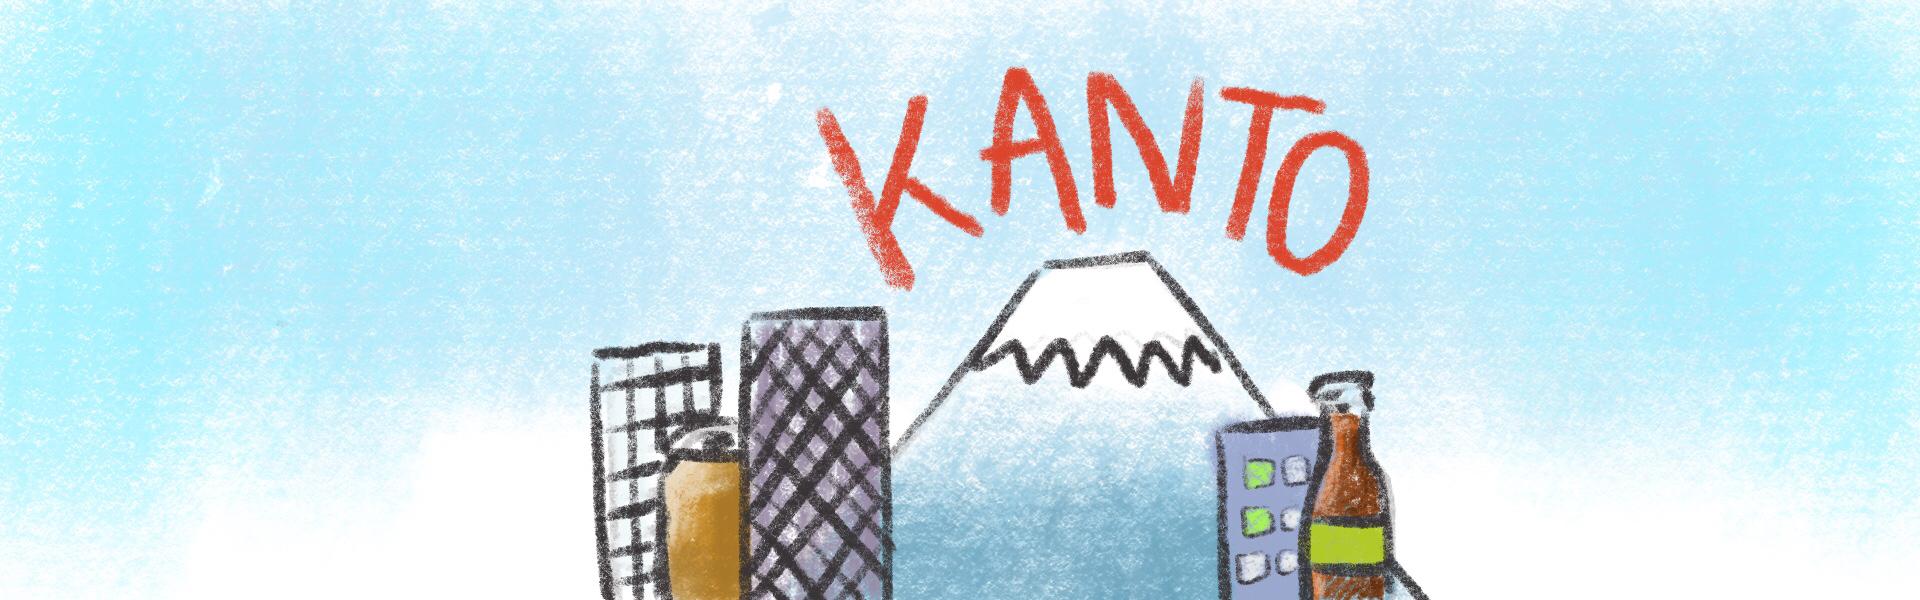 Kanto Banner